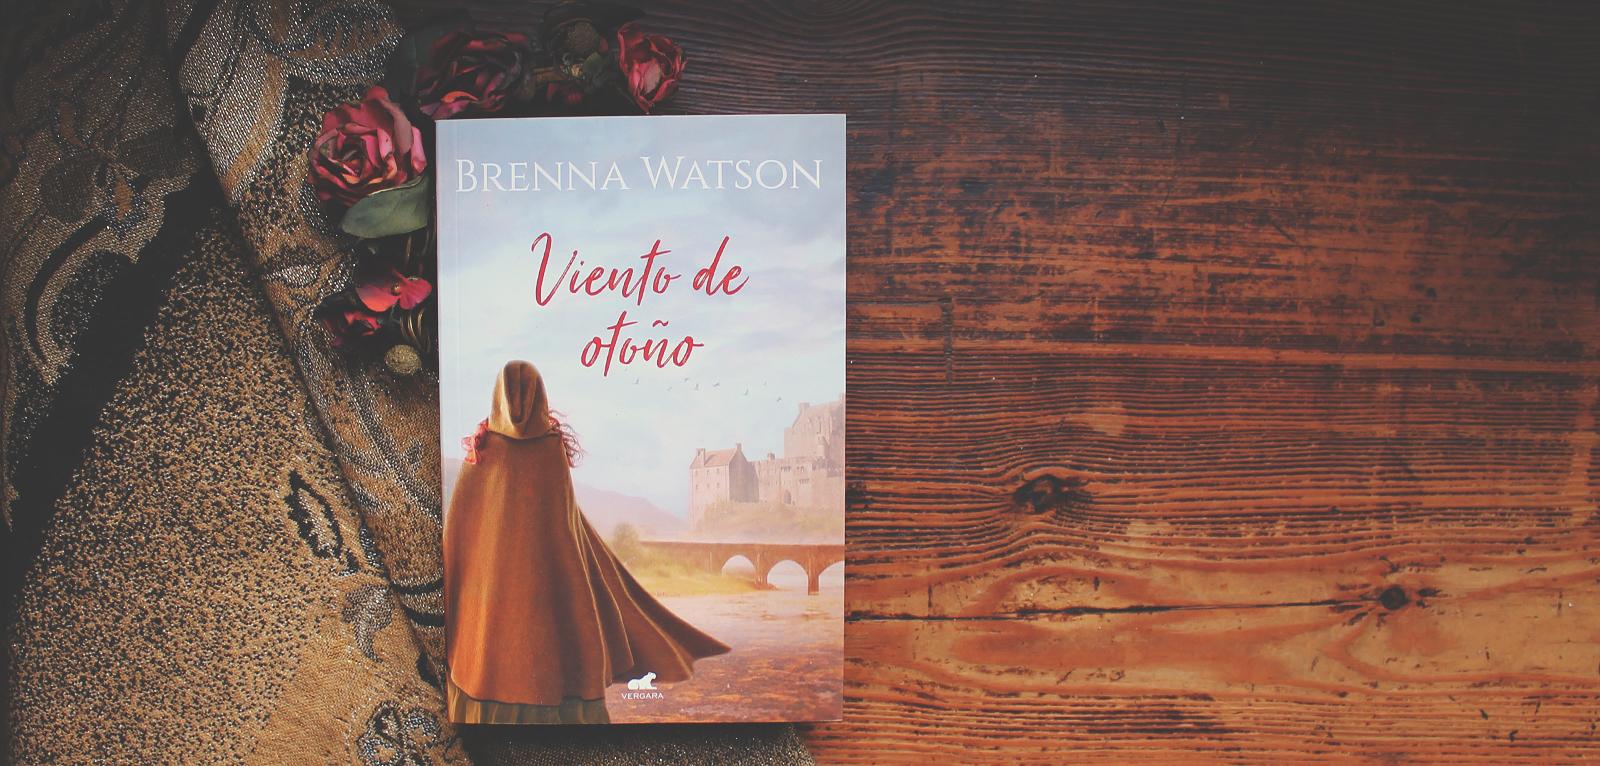 Viento de otoño · Brenna Watson